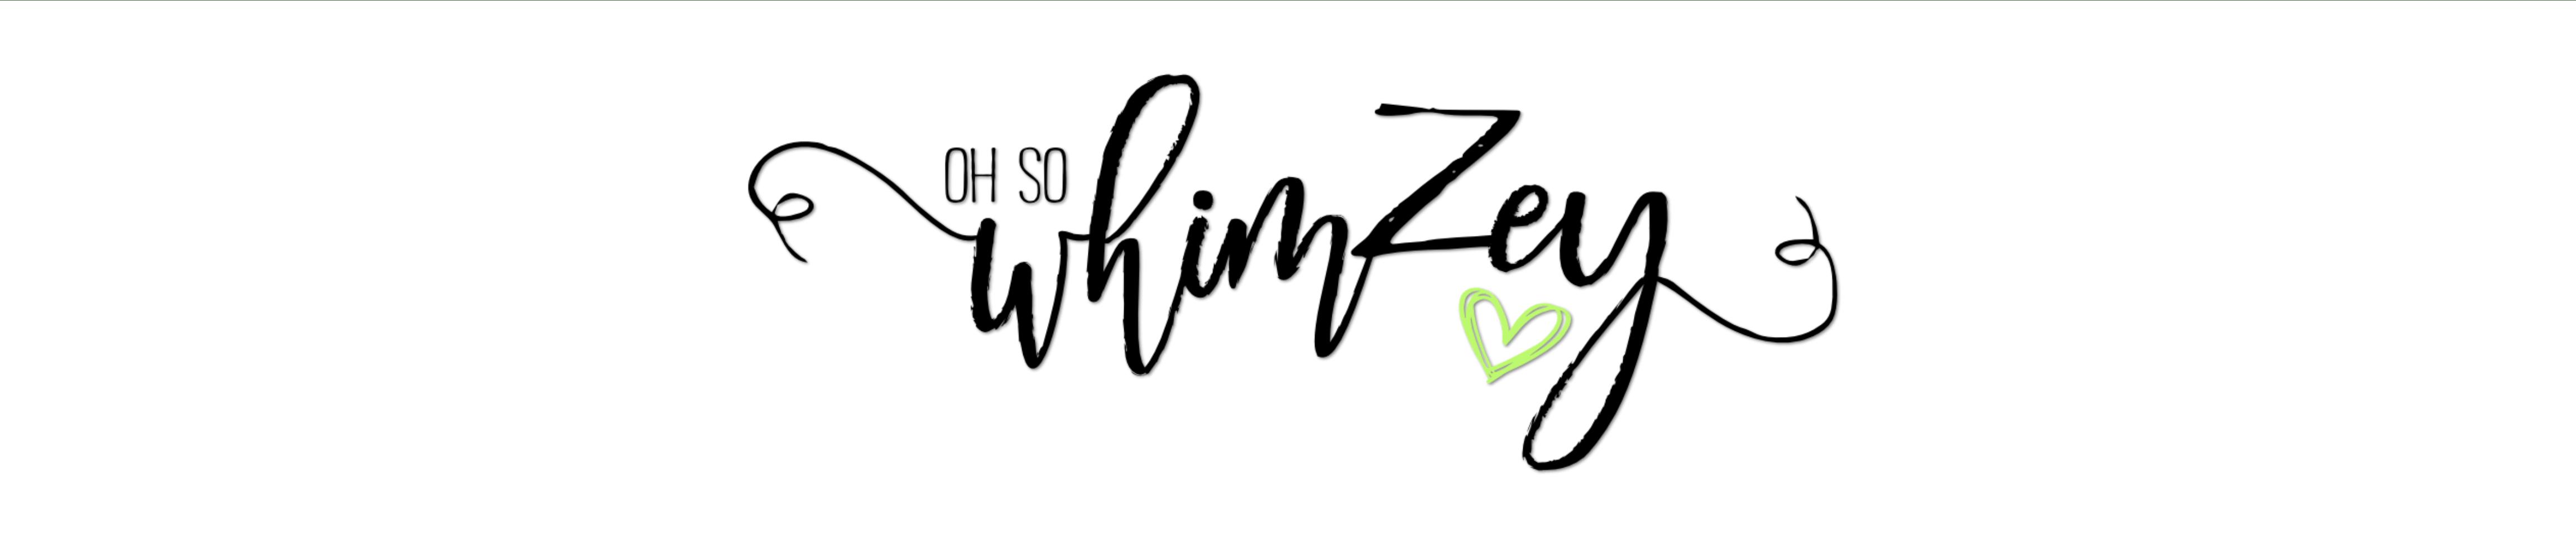 Oh So Whimzey | Digital Planning Designs